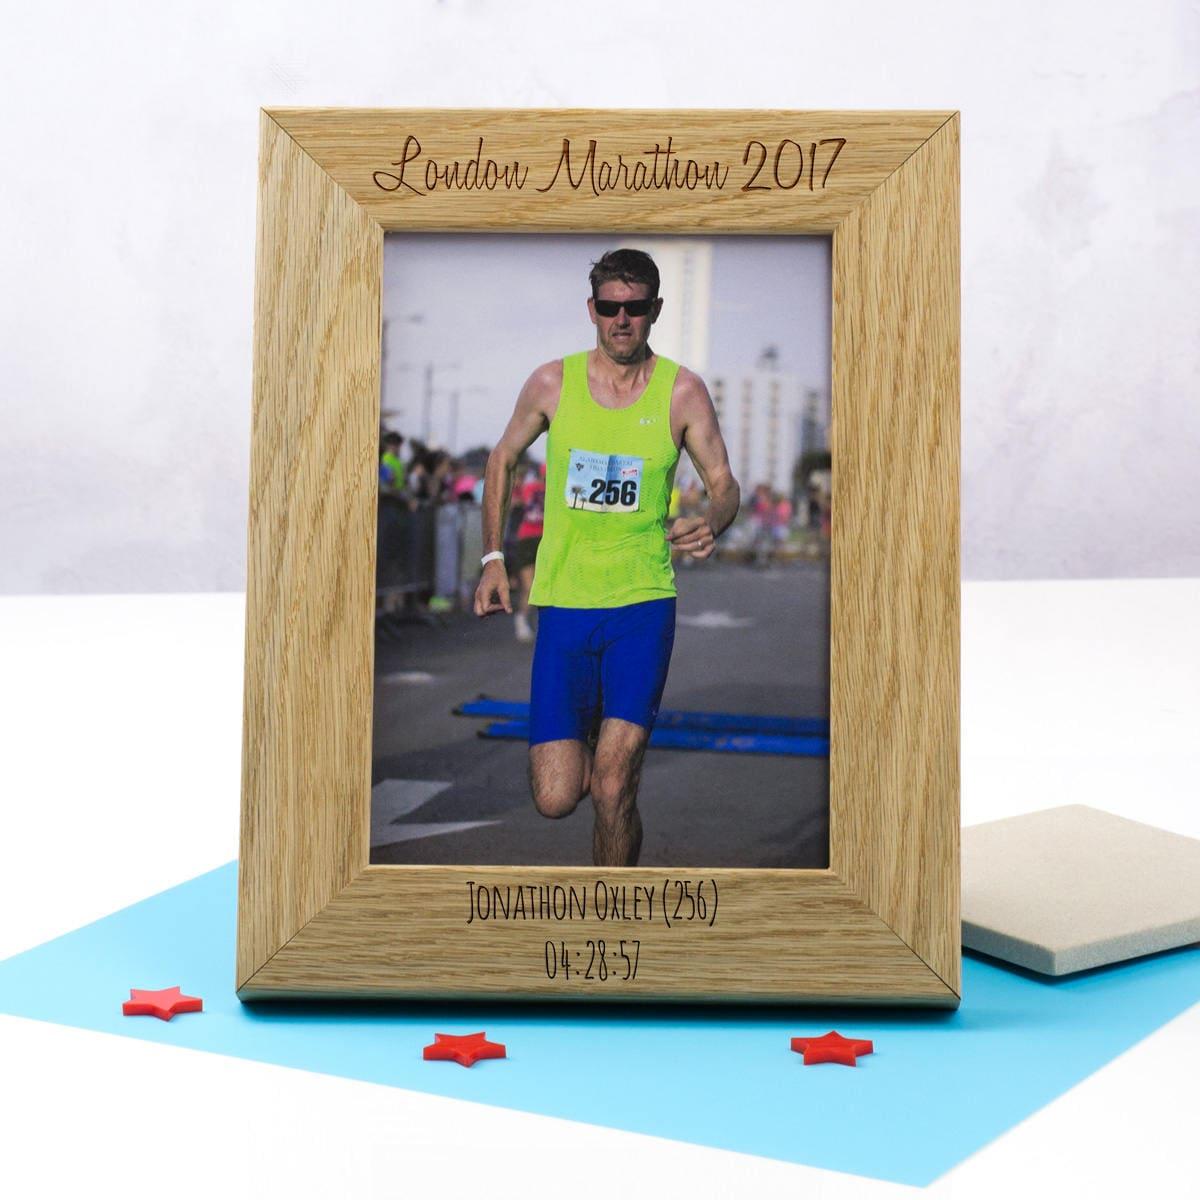 Sport-Event-Bilderrahmen personalisierte Marathon Rahmen | Etsy